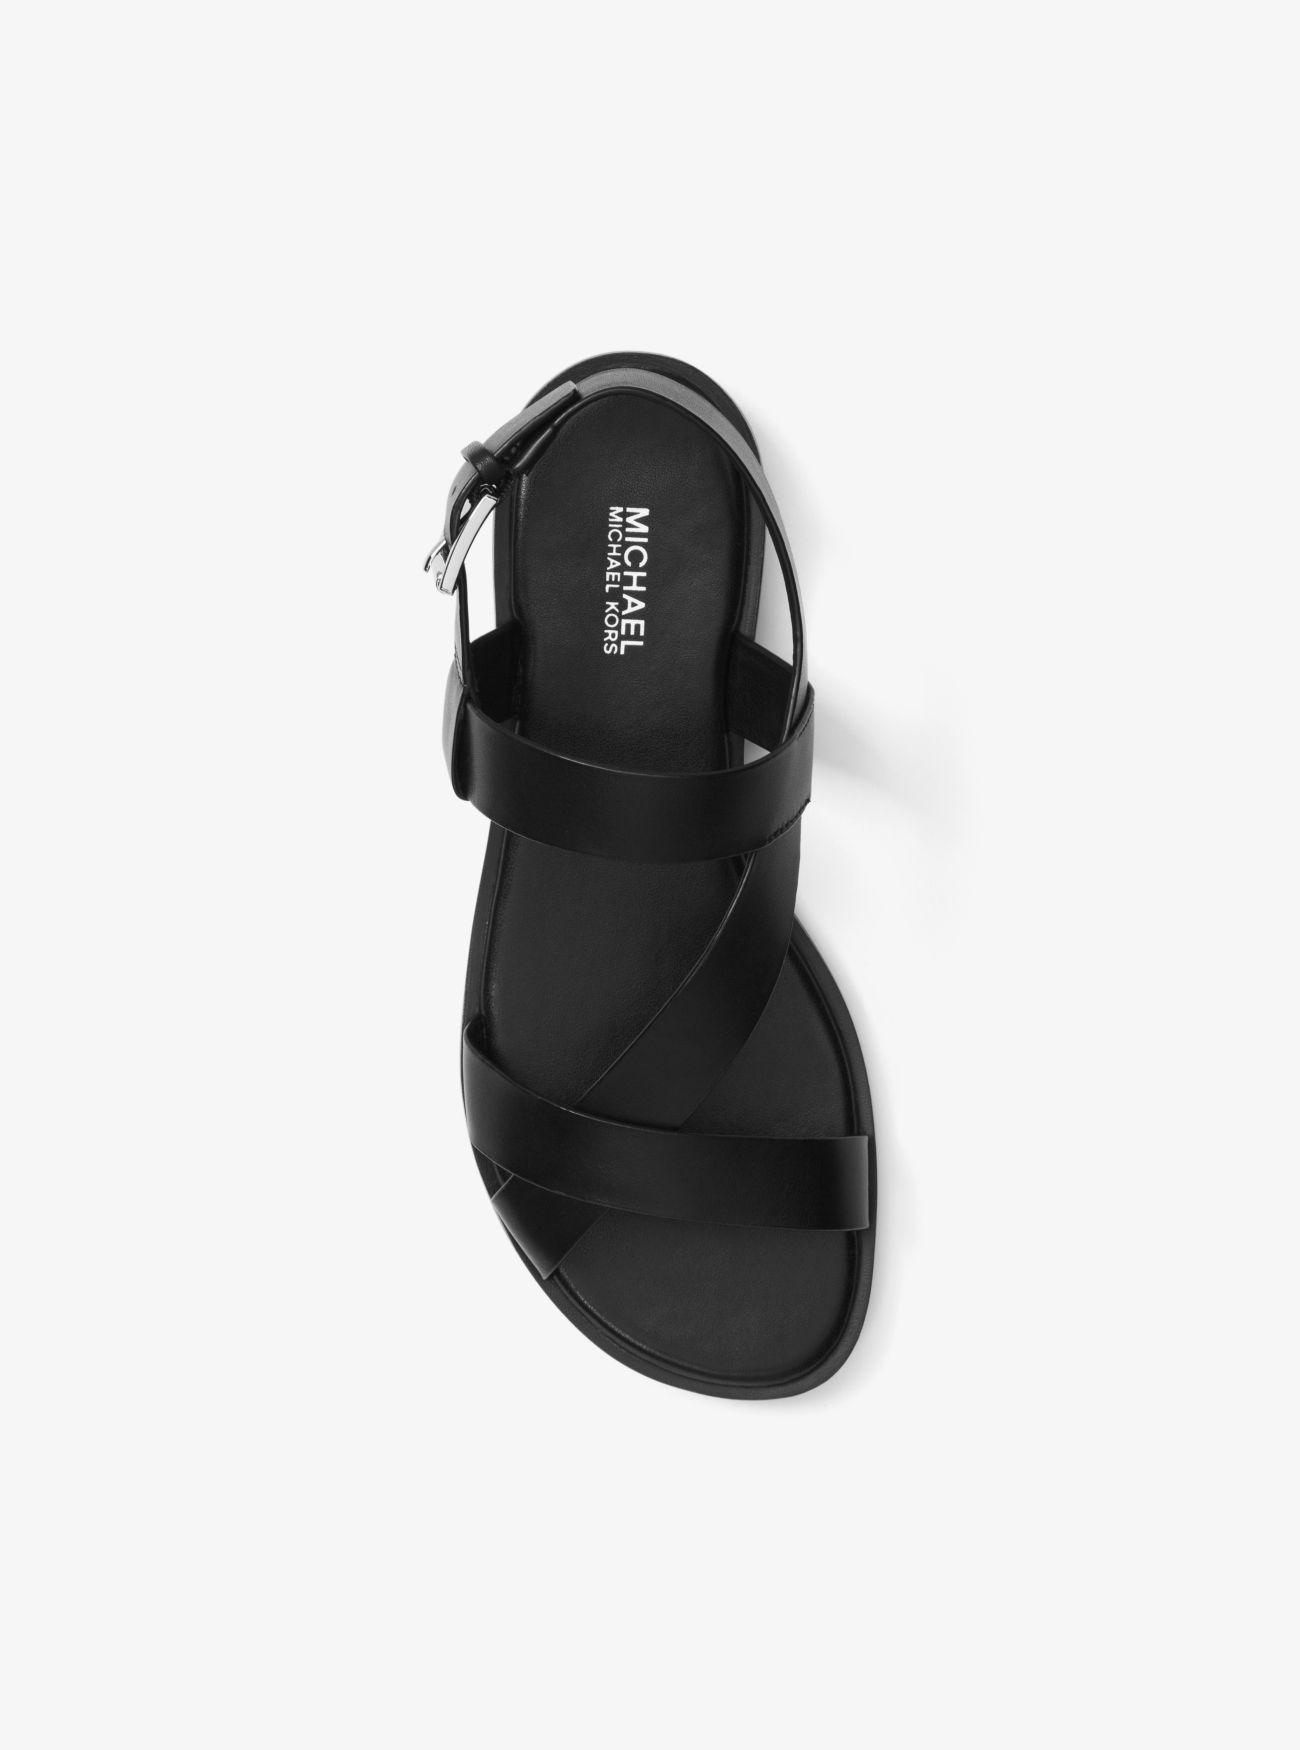 Michael Kors Mackay Leather Sandal in